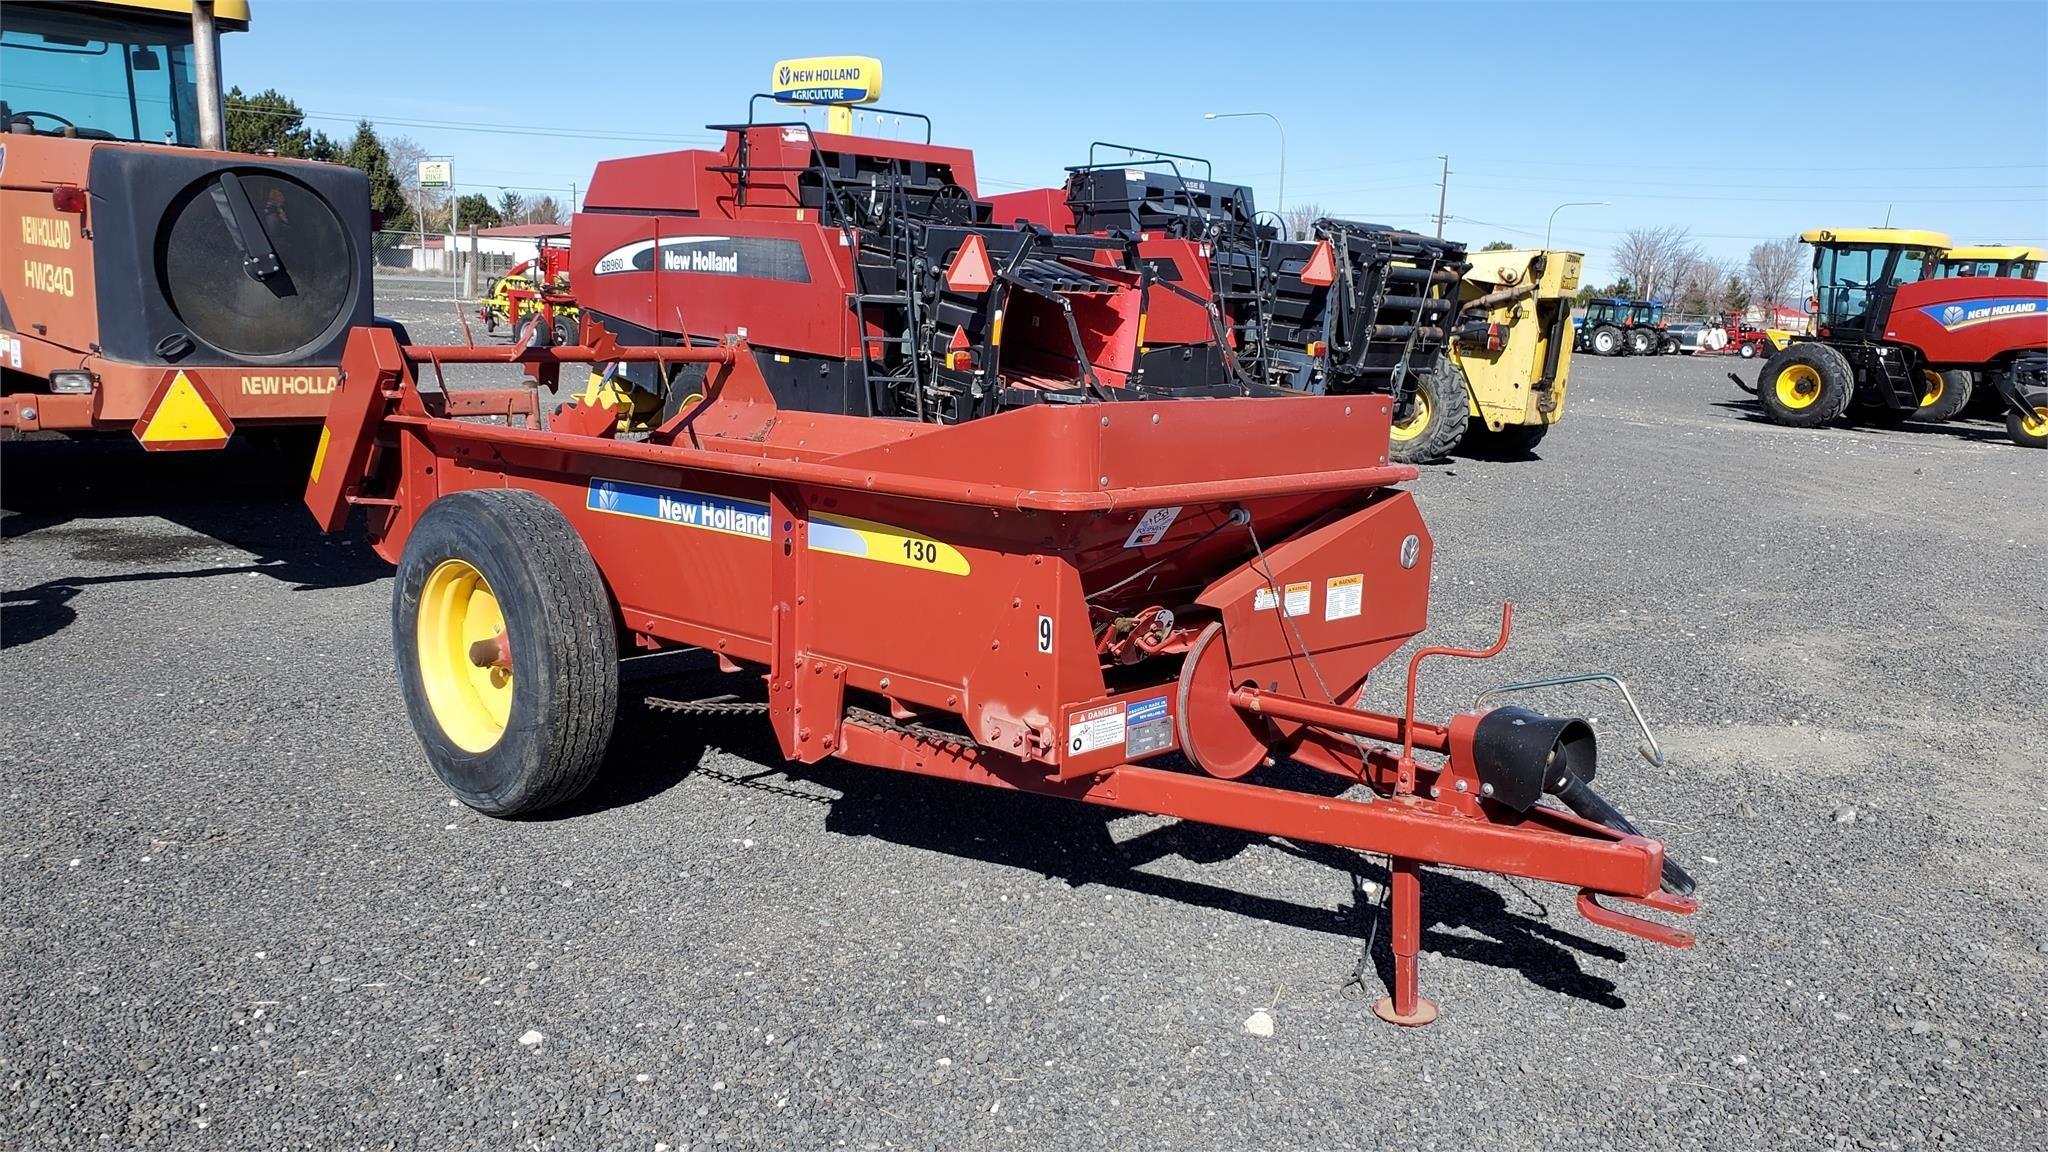 2013 New Holland 130 Manure Spreader